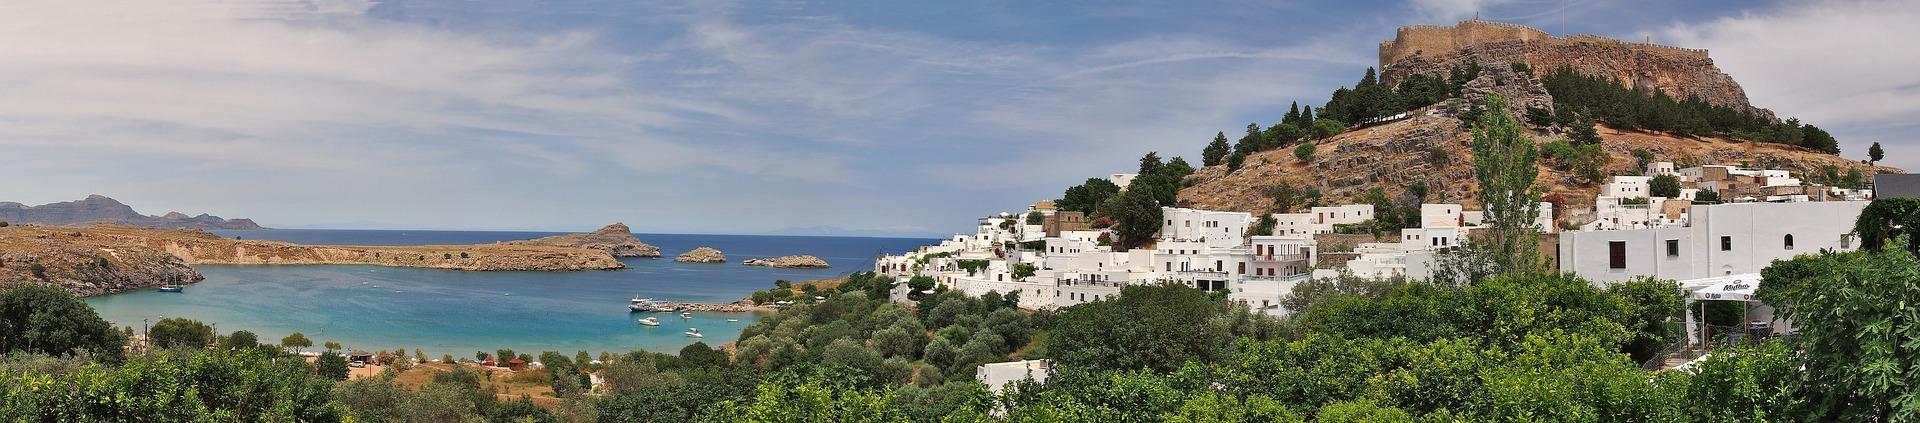 grčka, zanimljivosti, plaža, ostrvo, lindos, akropolj